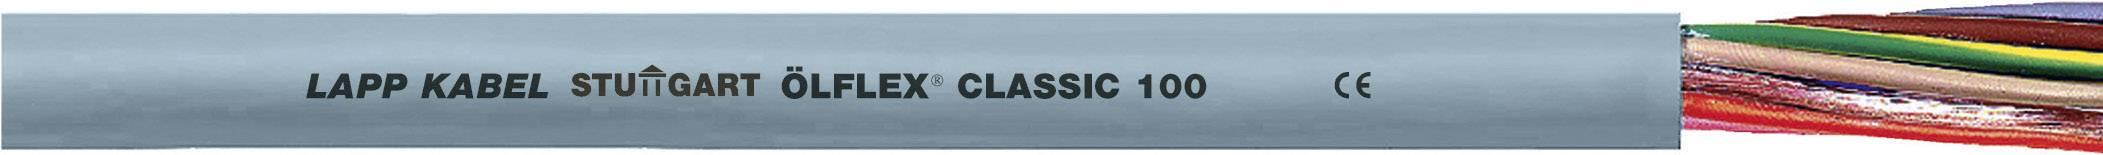 Kabel LappKabel Ölflex CLASSIC 100 3G95 (0010307), PVC, 41,3 mm, 750 V, šedá, 50 m